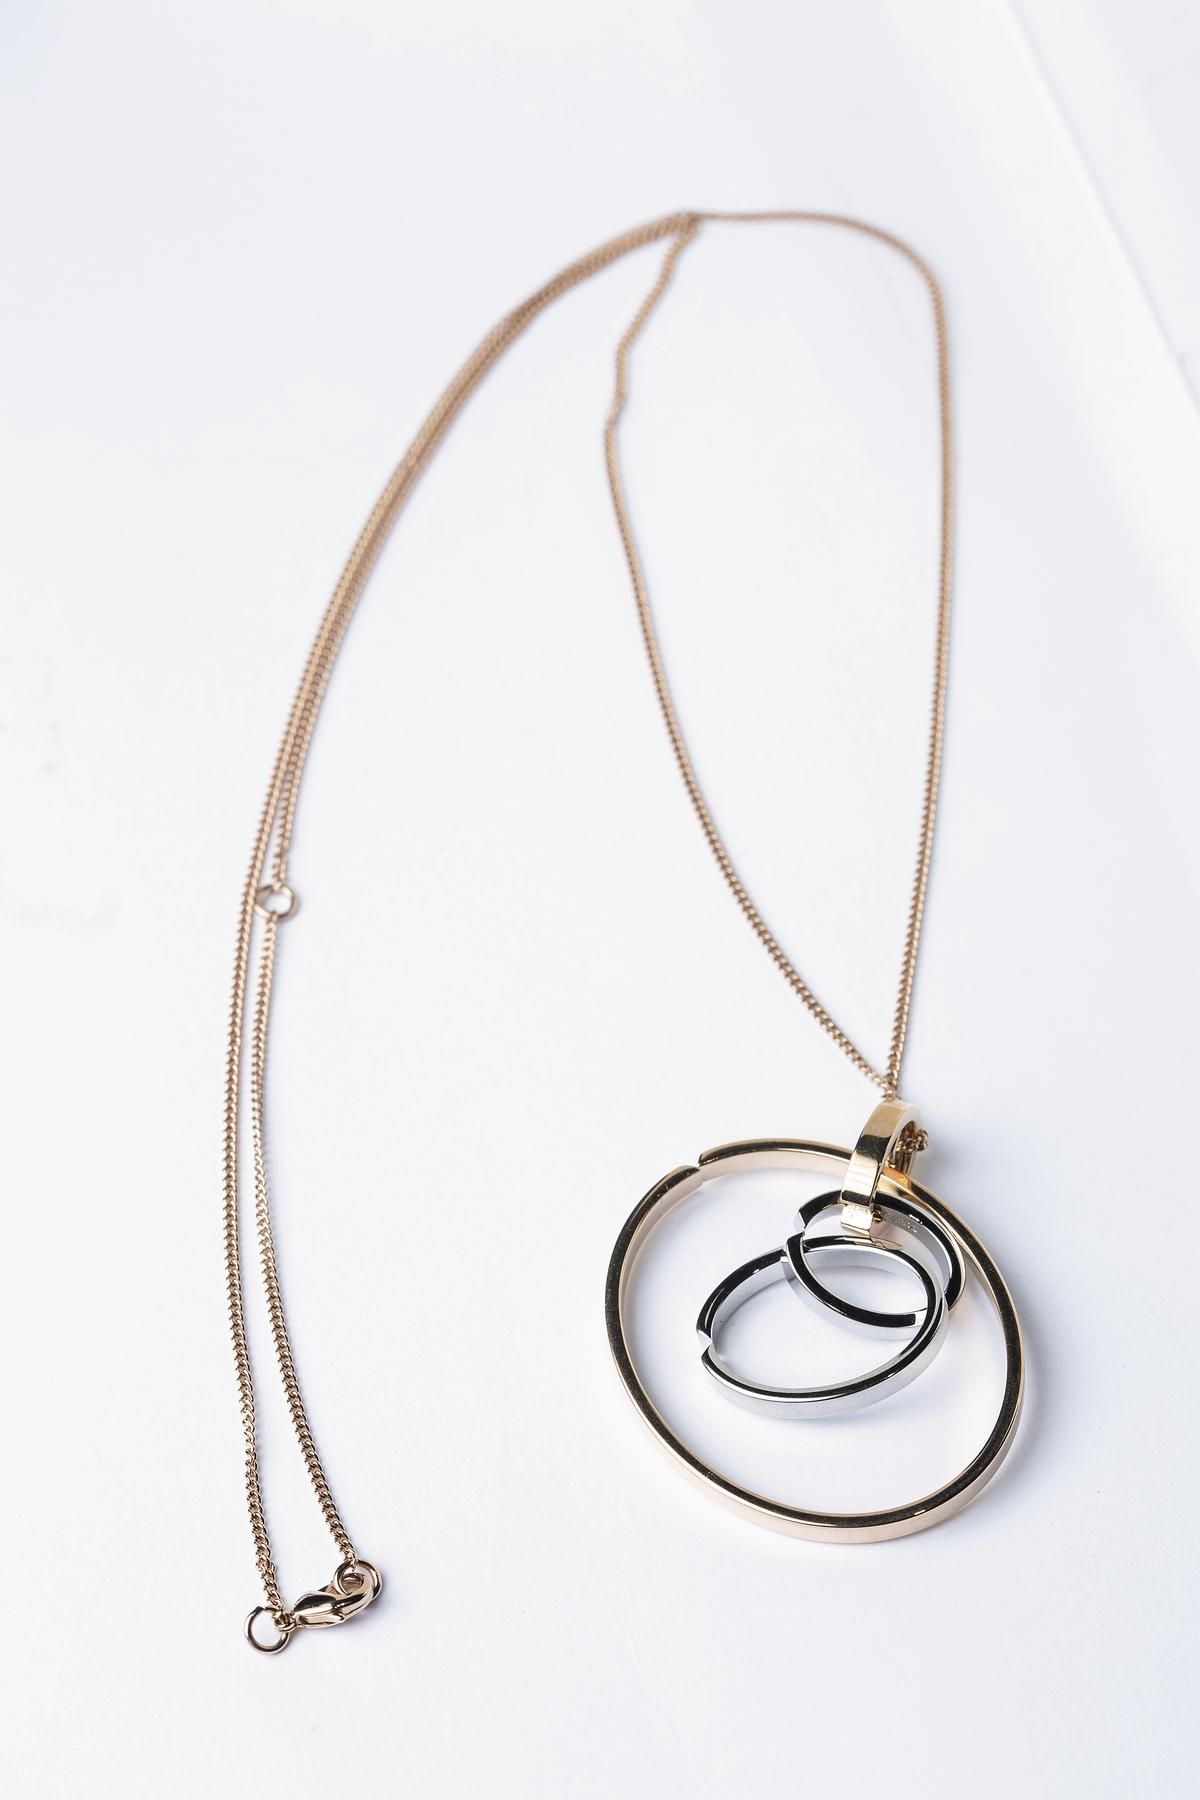 VITA FEDE幾何圖形項鍊。NT$15,500